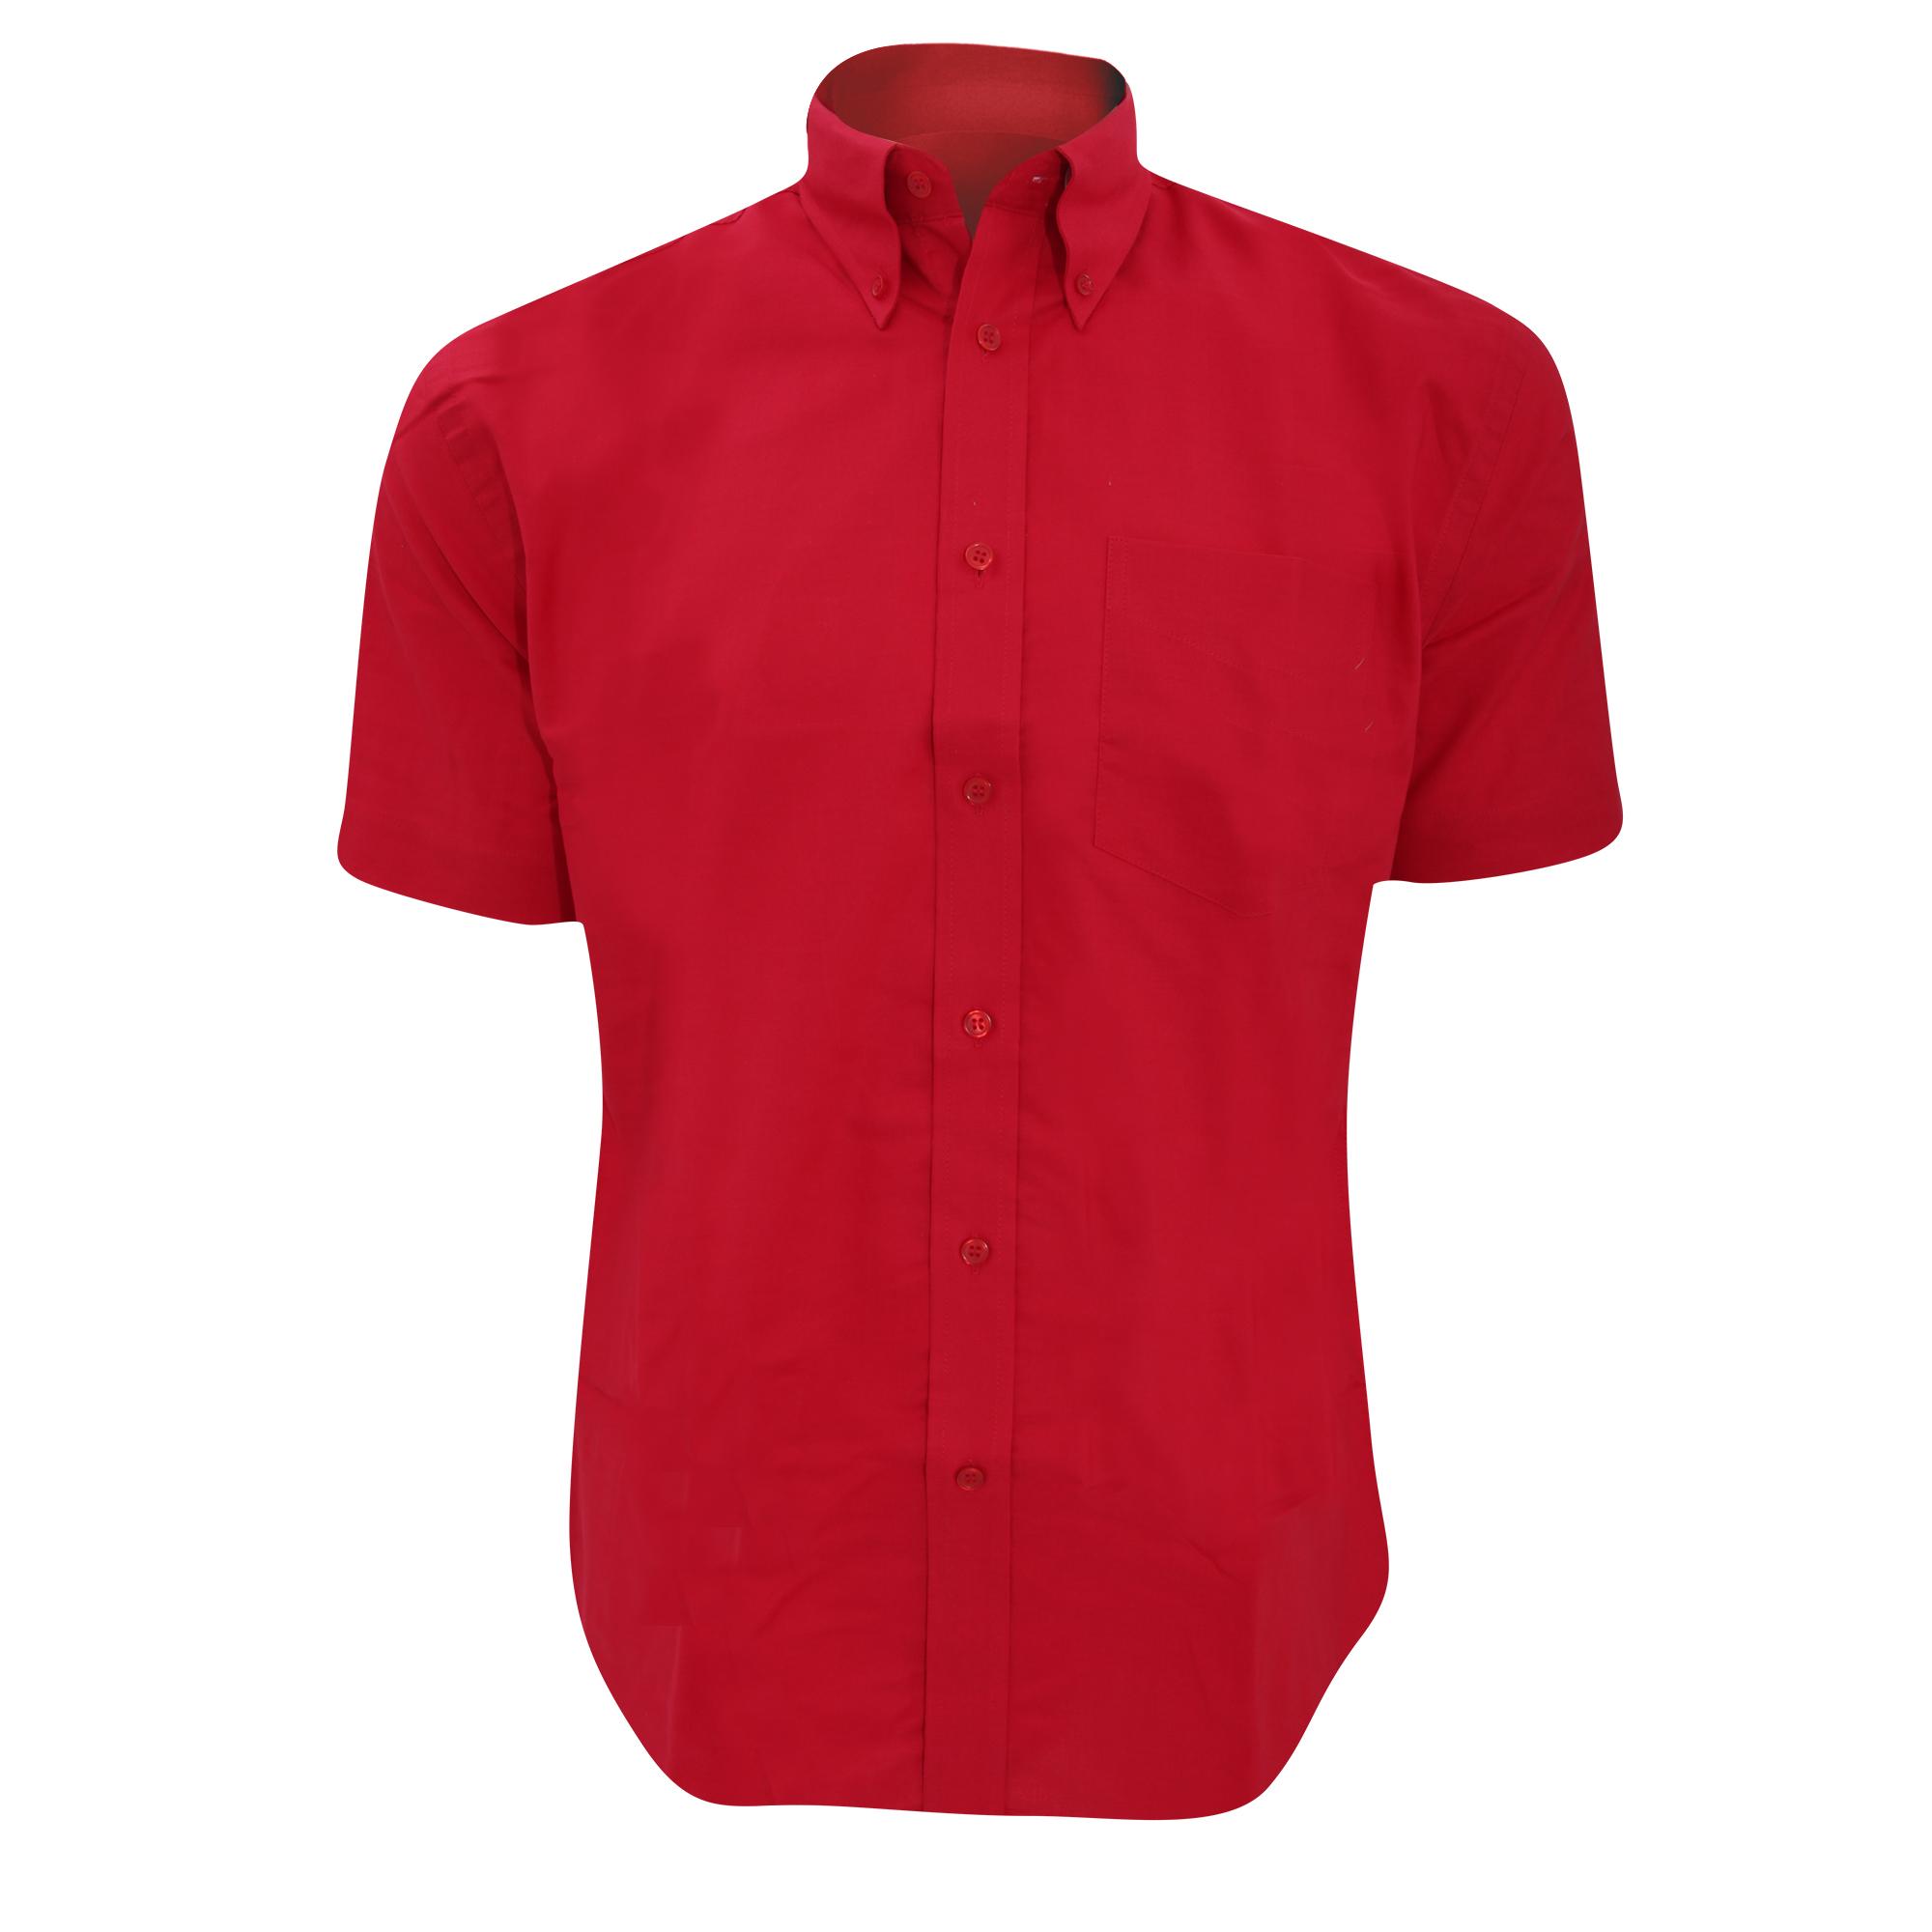 Kustom Kit Mens Workwear Oxford Short Sleeve Shirt (20inch) (Black)